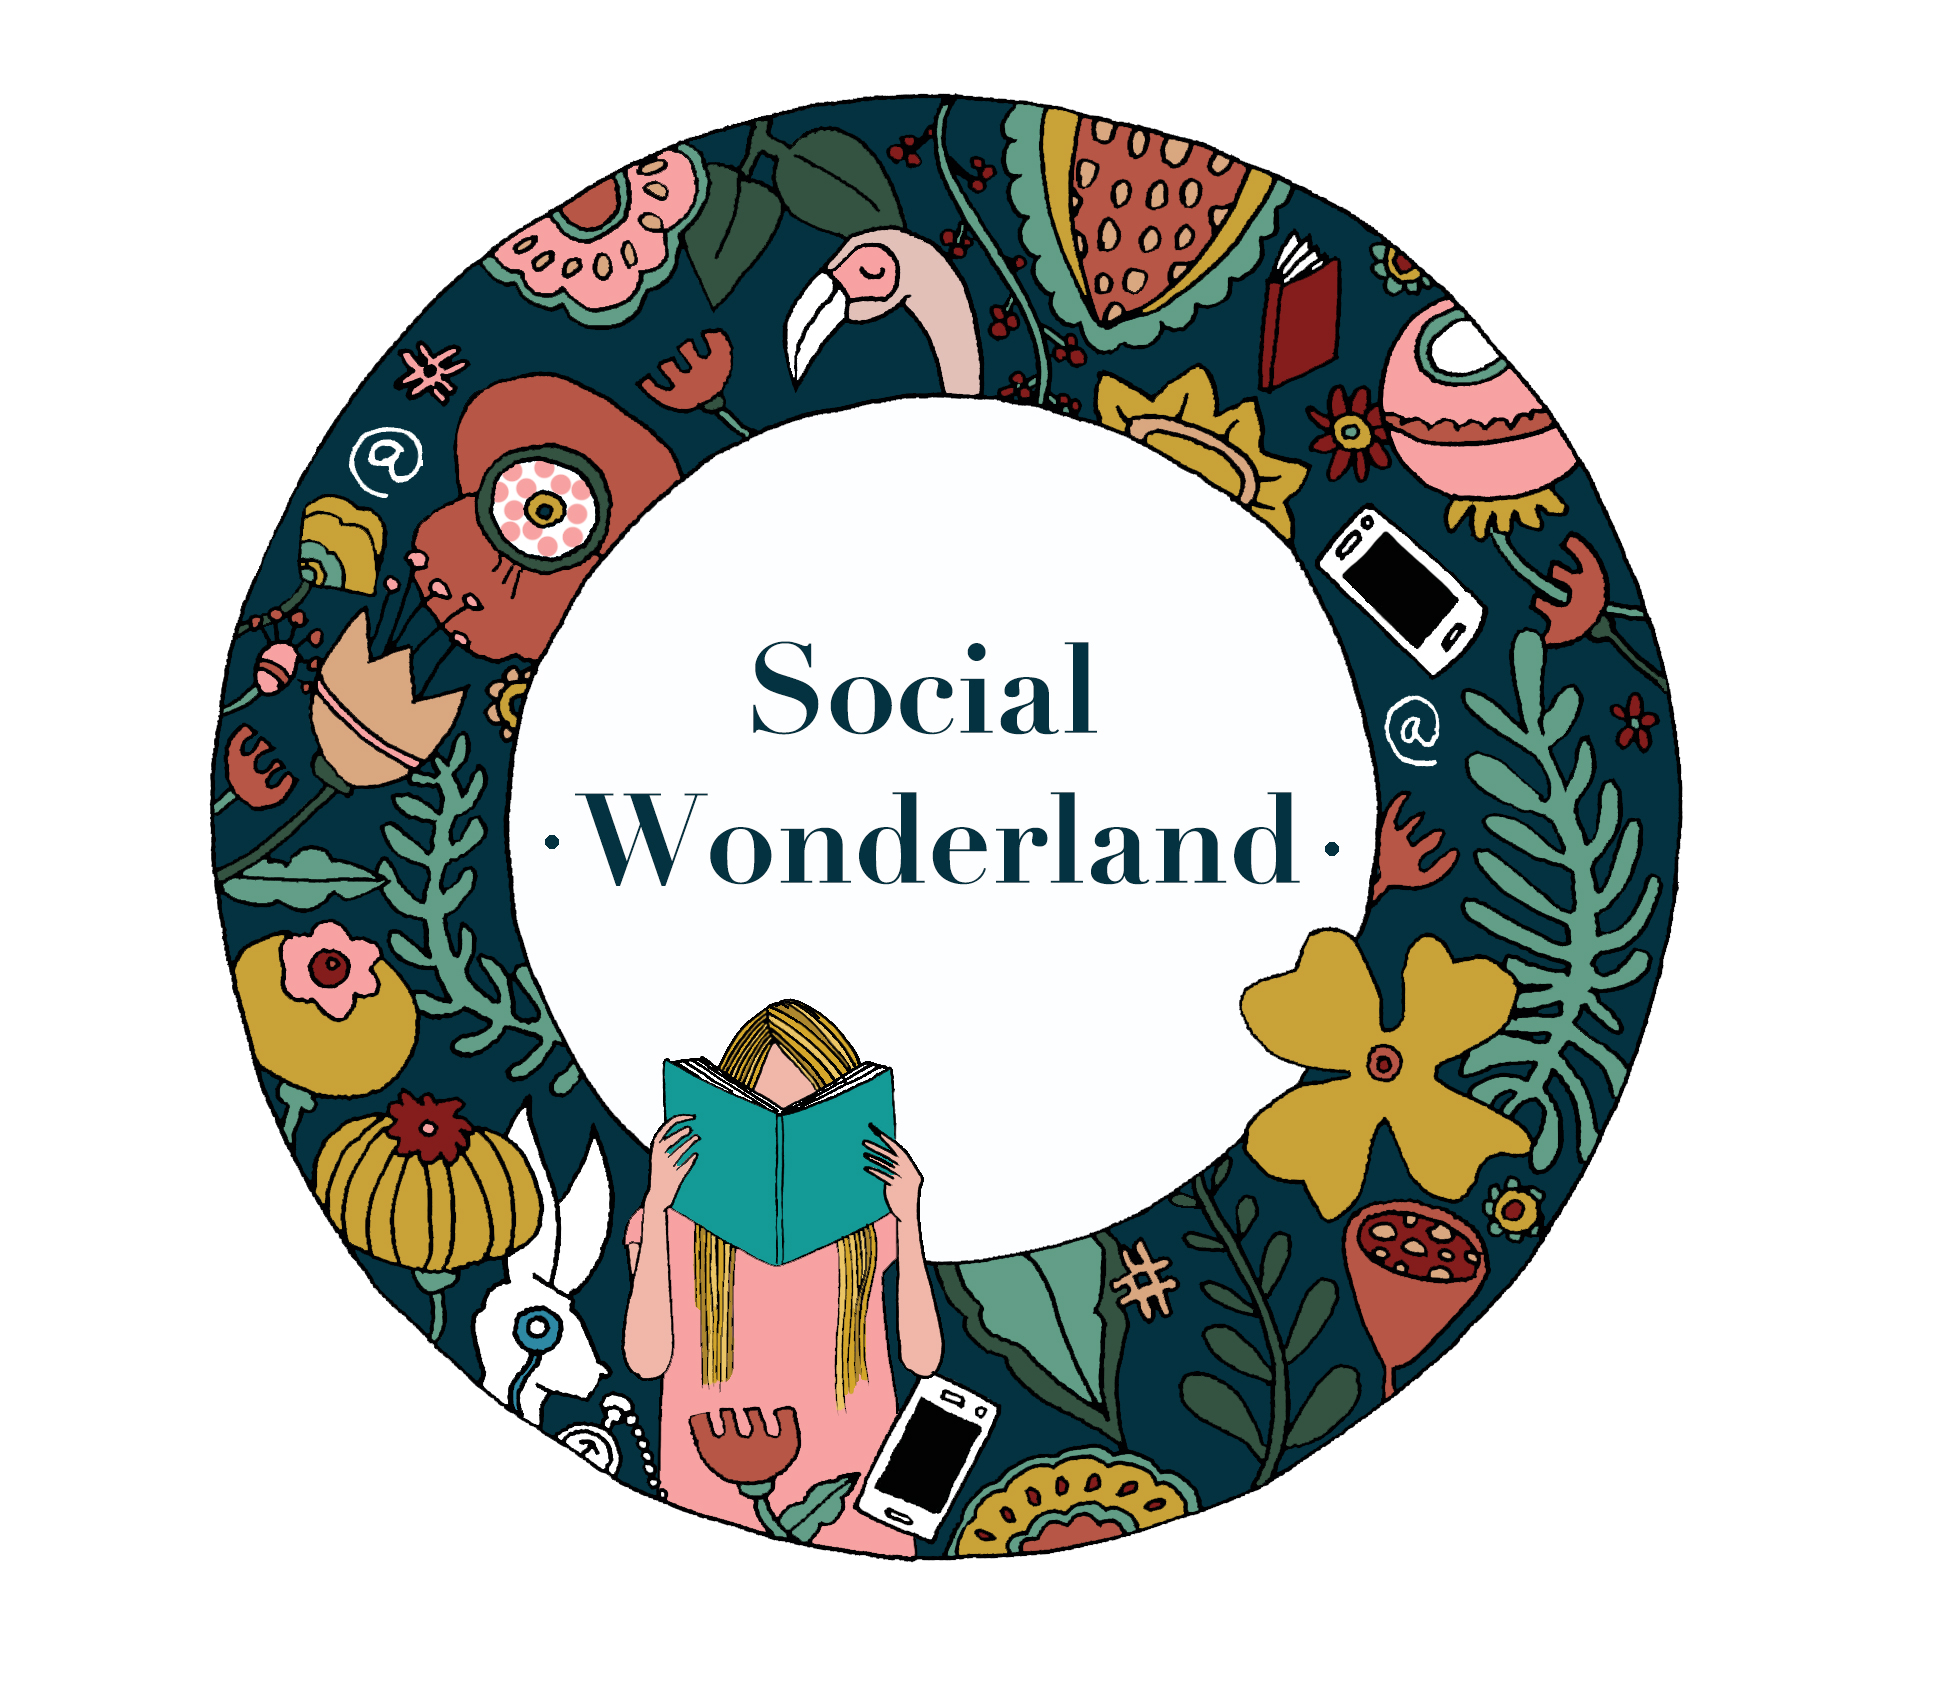 Social Wonderland